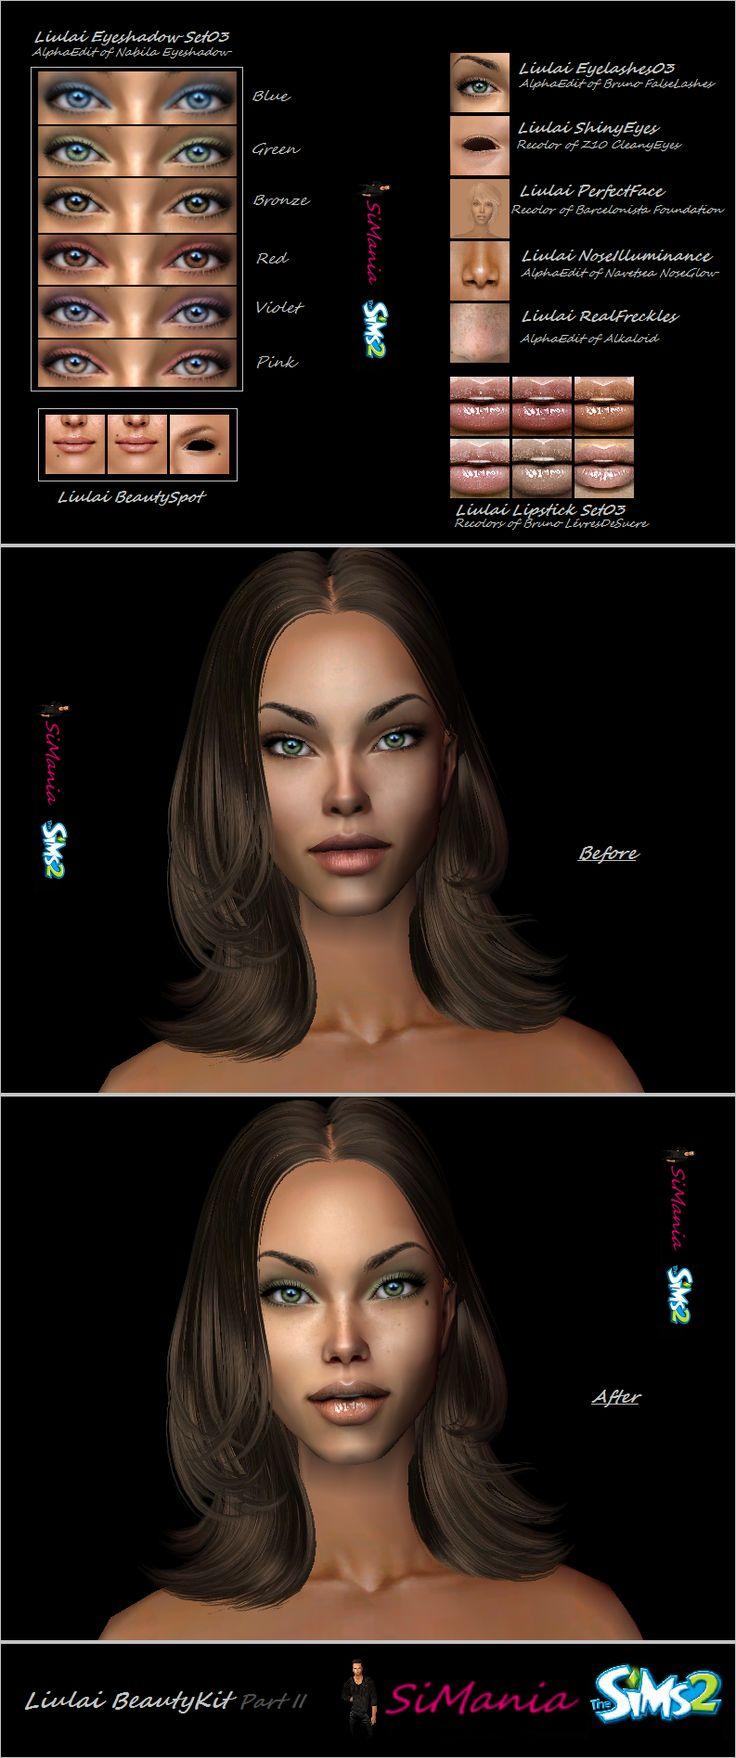 *Download Liulai-BeautyKit Part II http://www.mediafire.com/download/mkjdd7d32ru1dxw